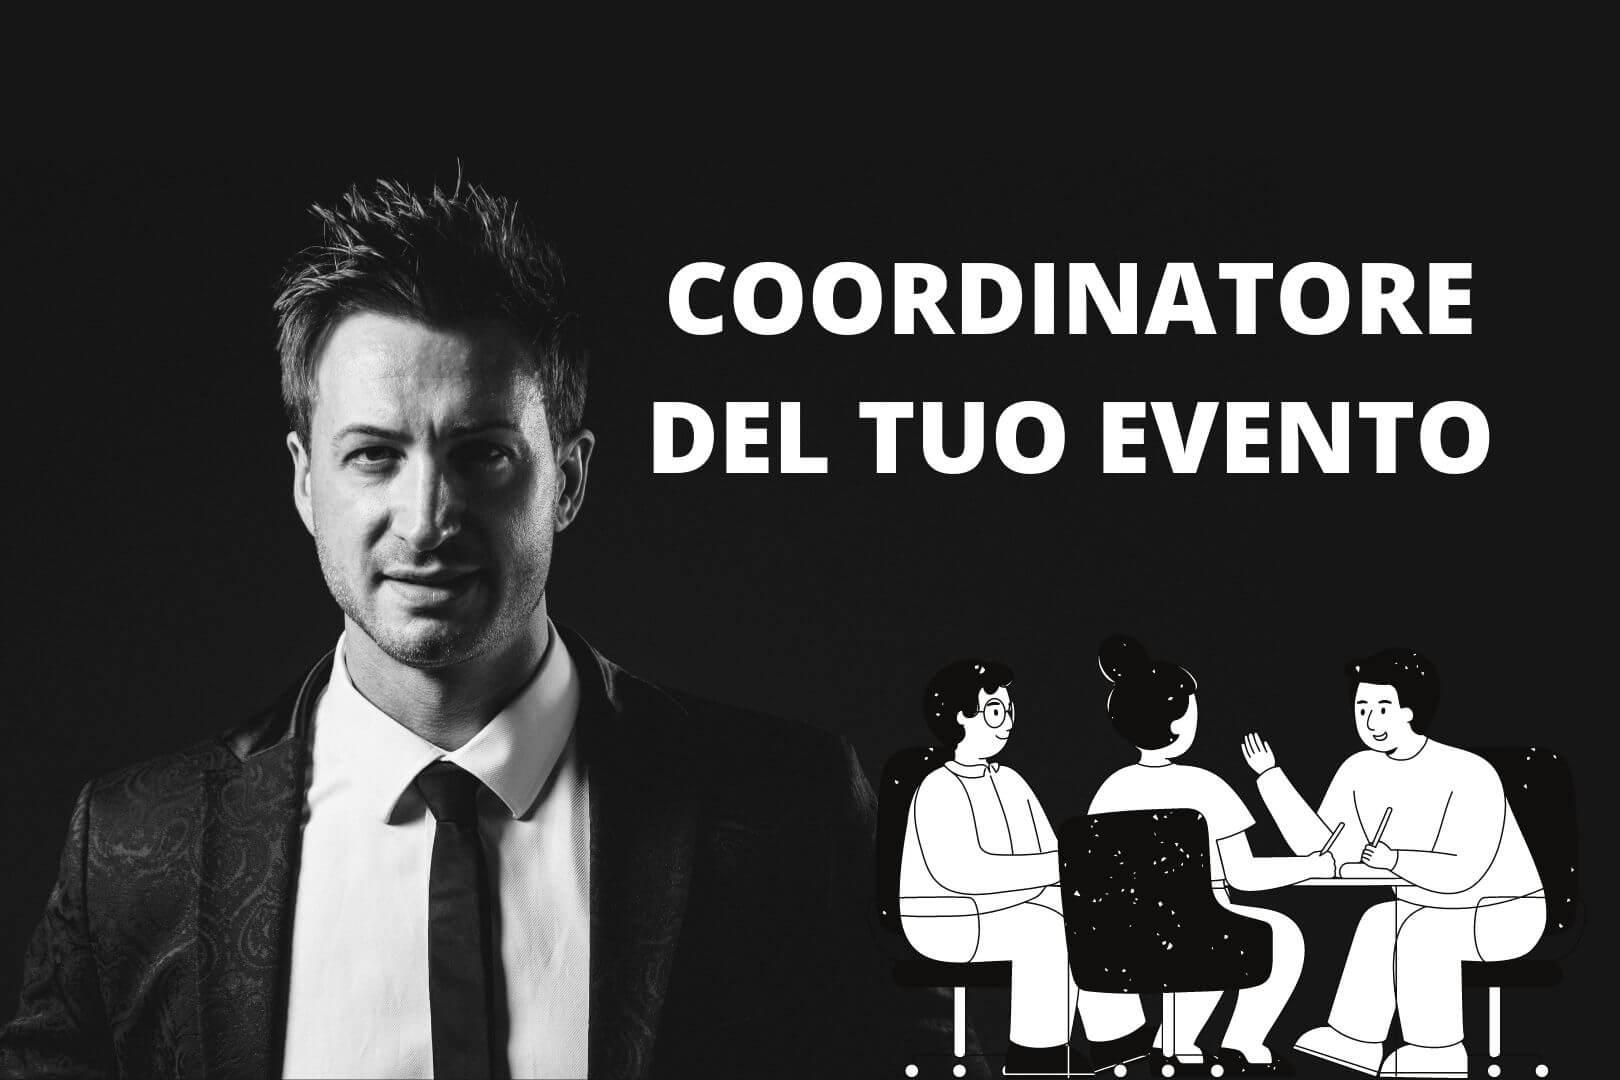 coordinatore-evento-organizzatore-thomas-de-gobbi-dj-sax-matrimonio